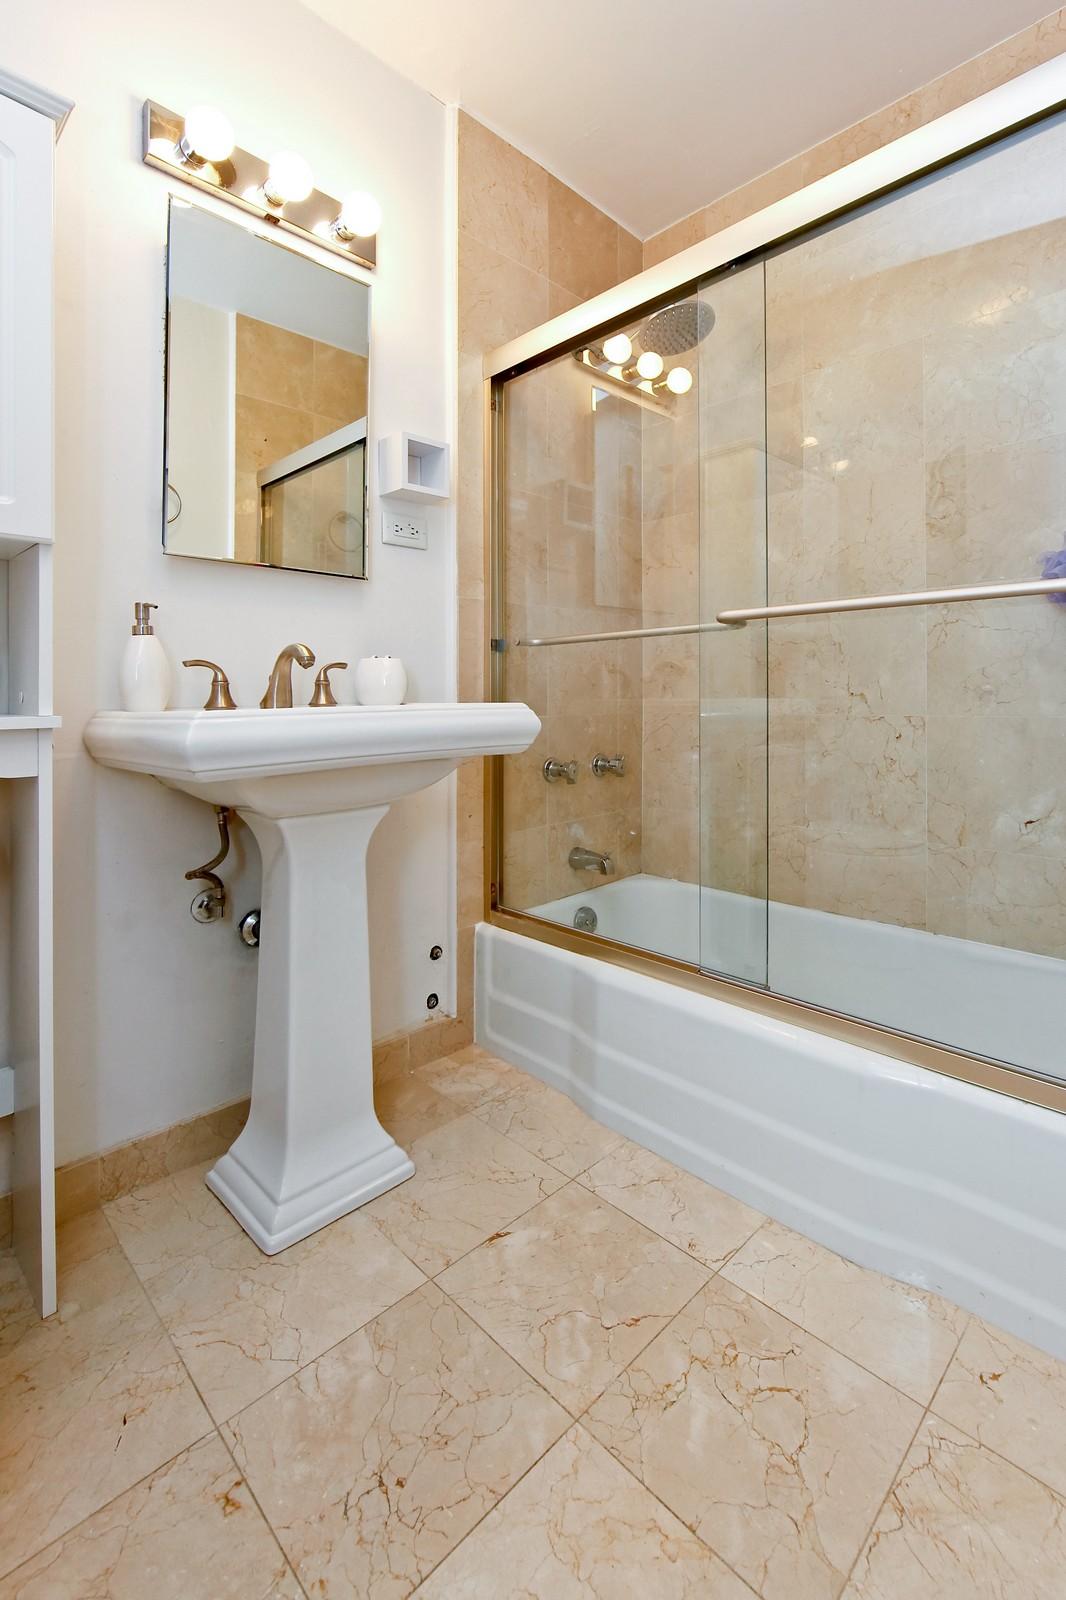 Real Estate Photography - 1360 Sandburg, 2103, Chicago, IL, 60610 - Bathroom